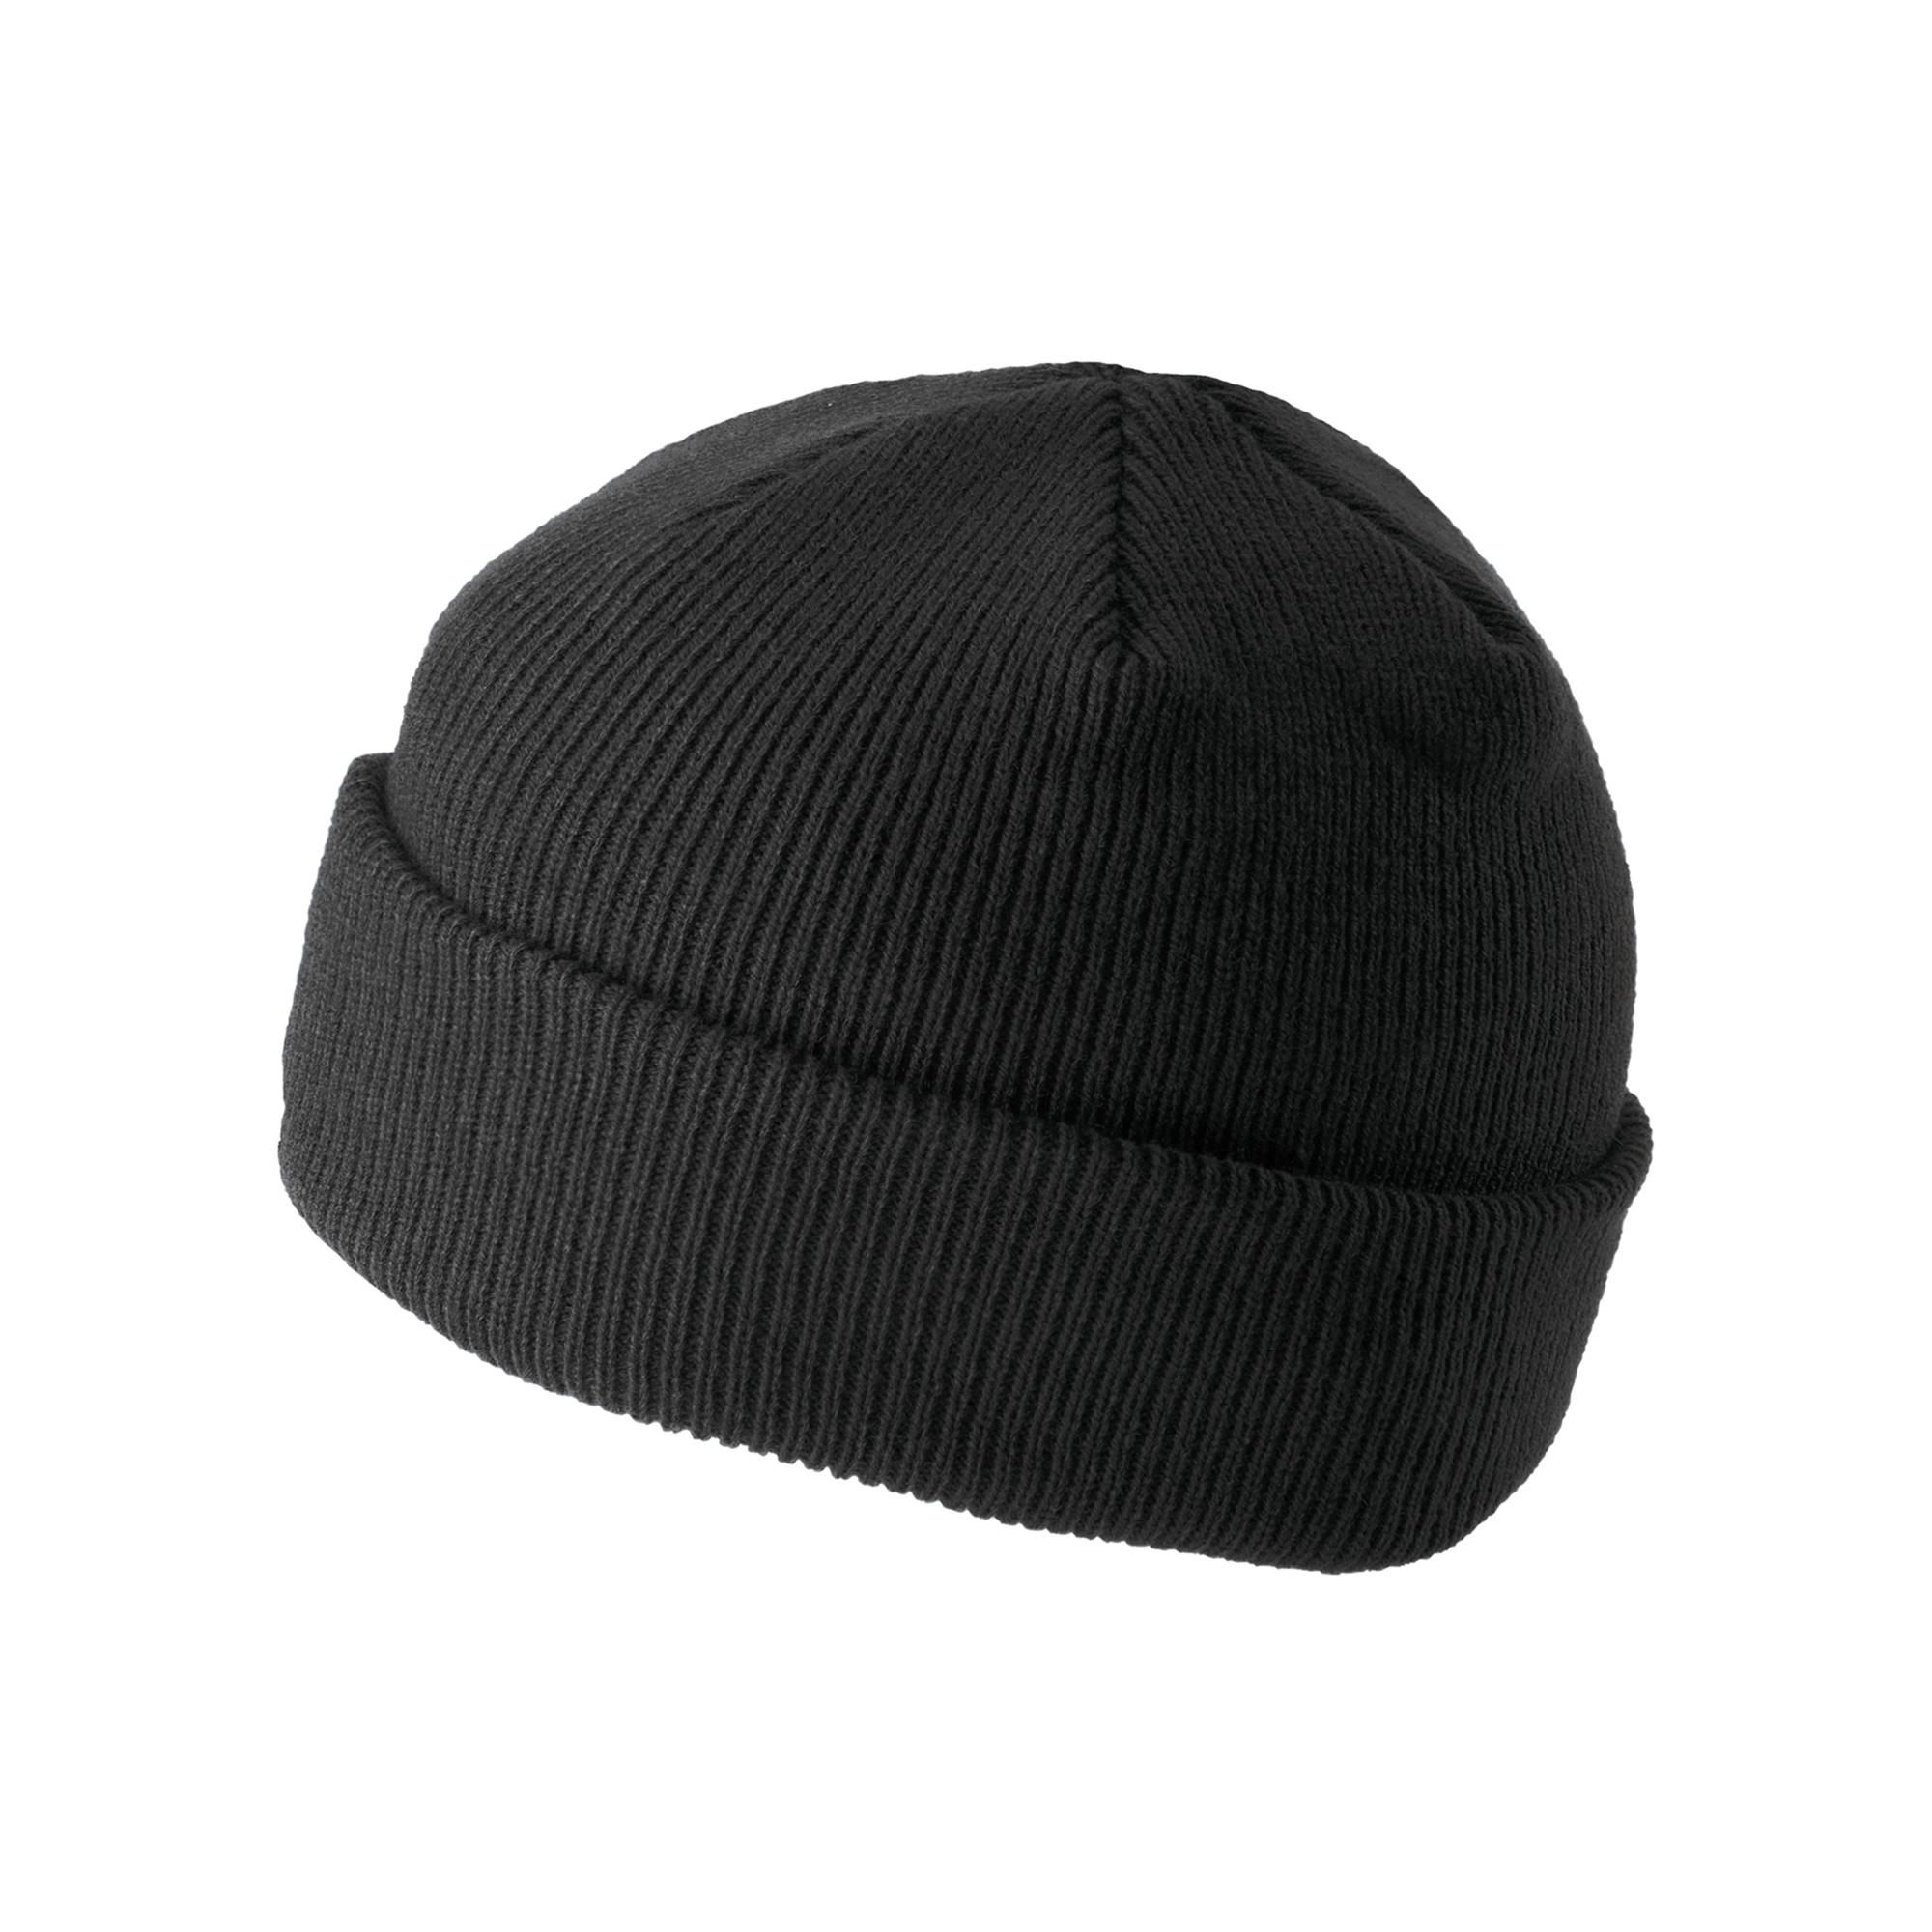 Kathmandu Fyfe Beanie  - Black - Size: ONE